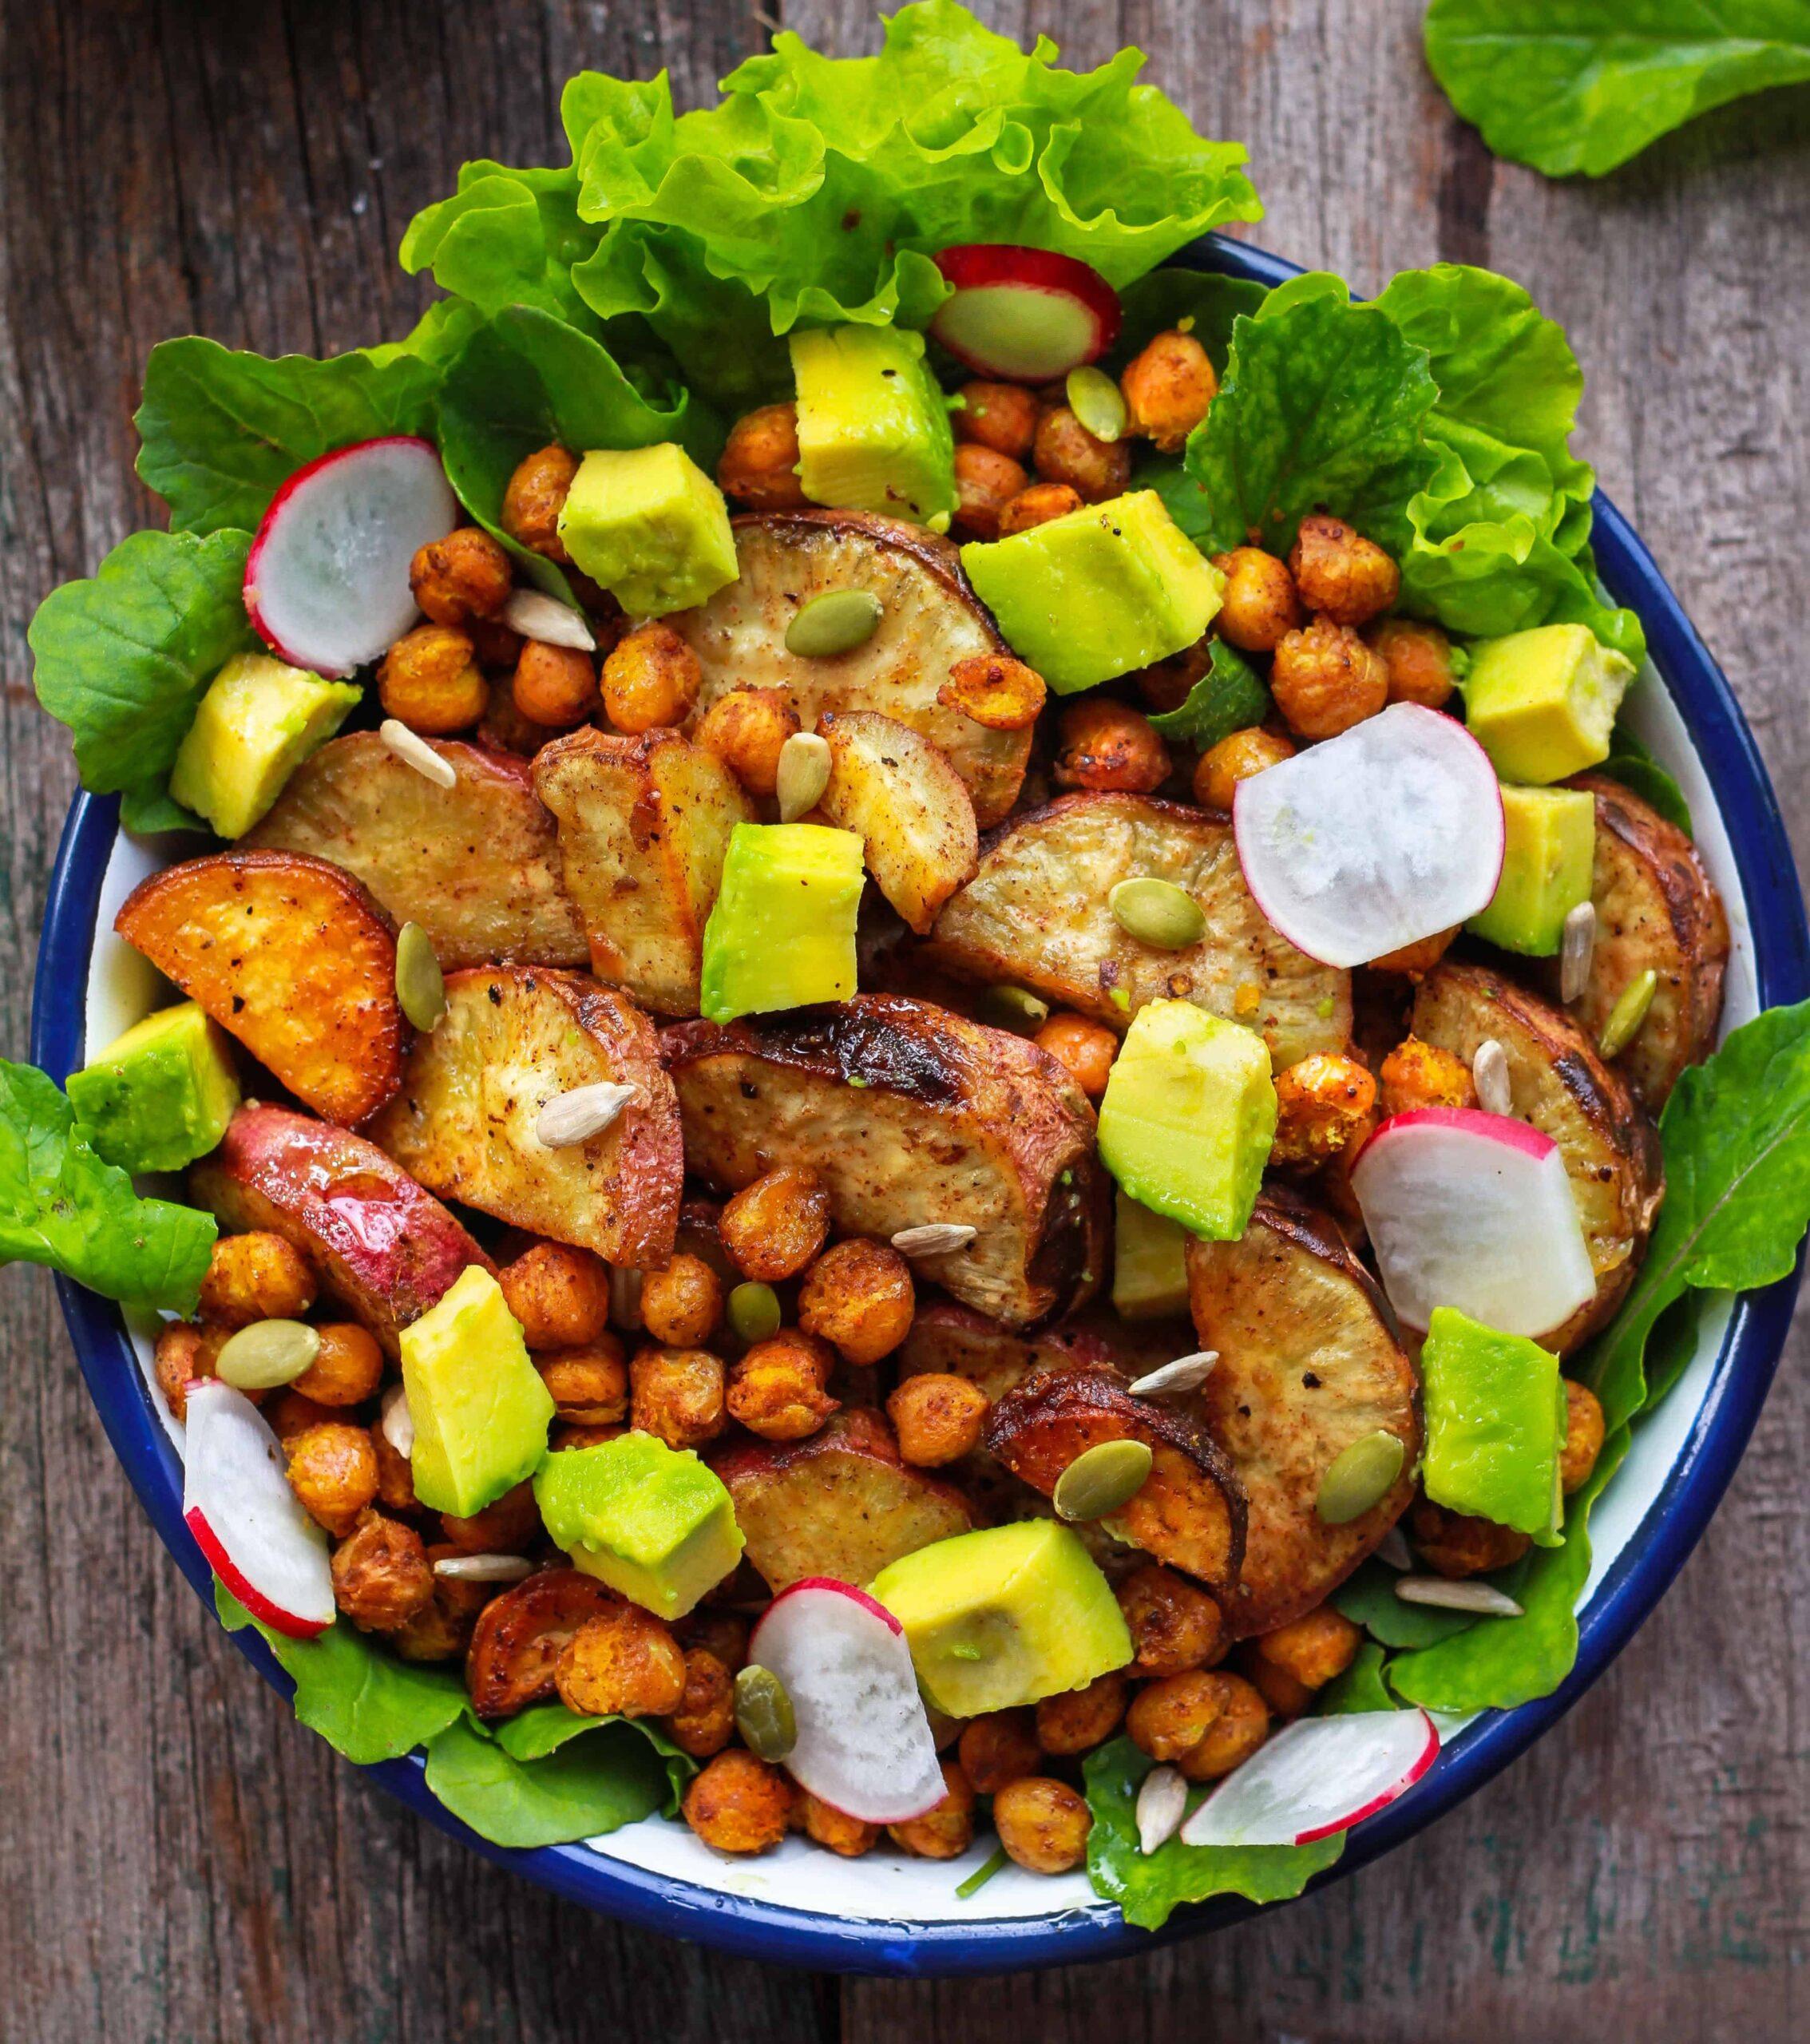 Roasted Sweet Potato and Chickpea Salad